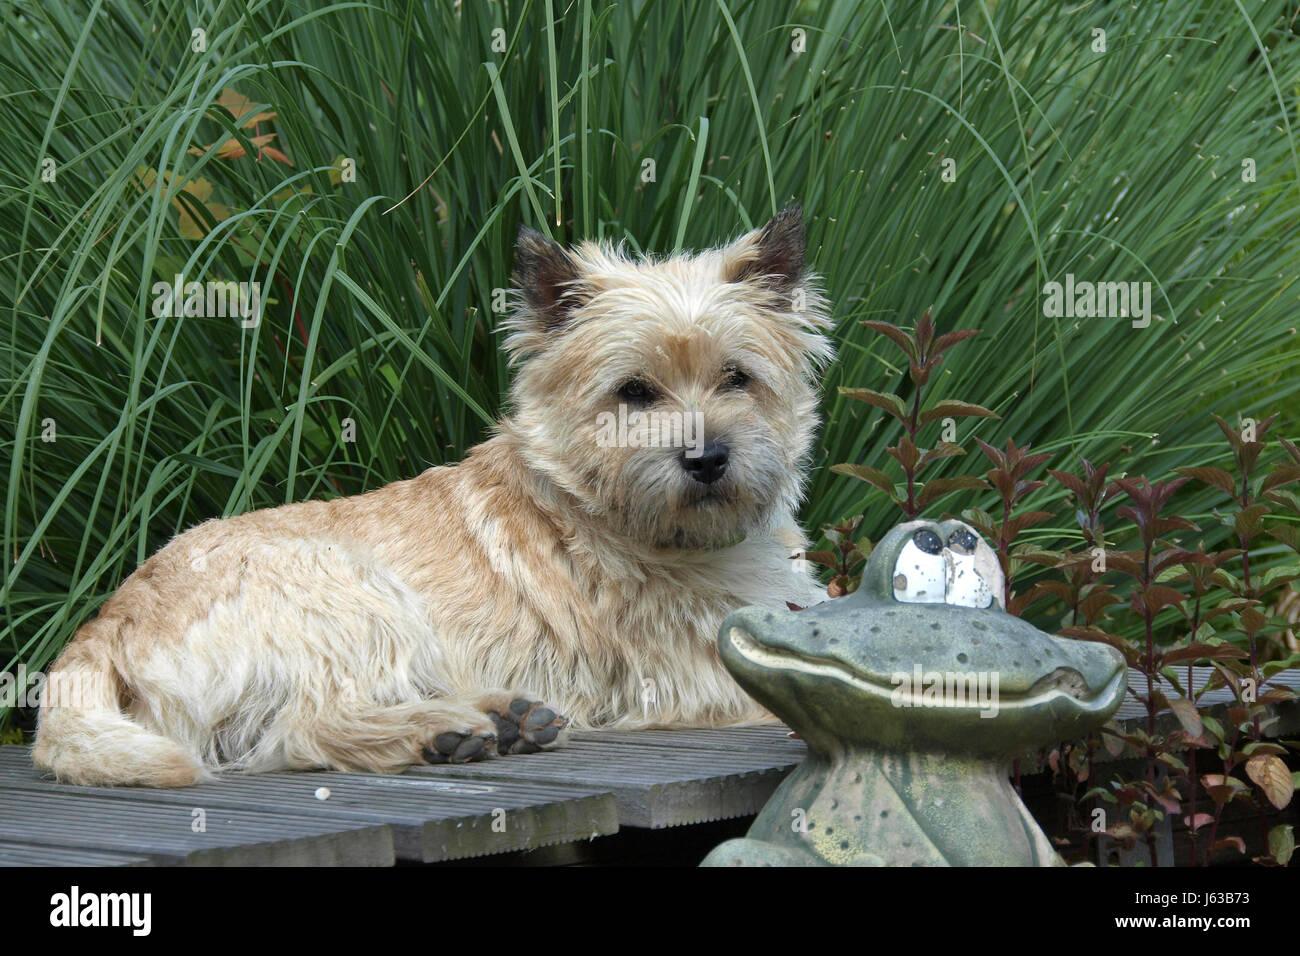 dog terrier species animal dog race species cairn hunderasse cairn terrier - Stock Image